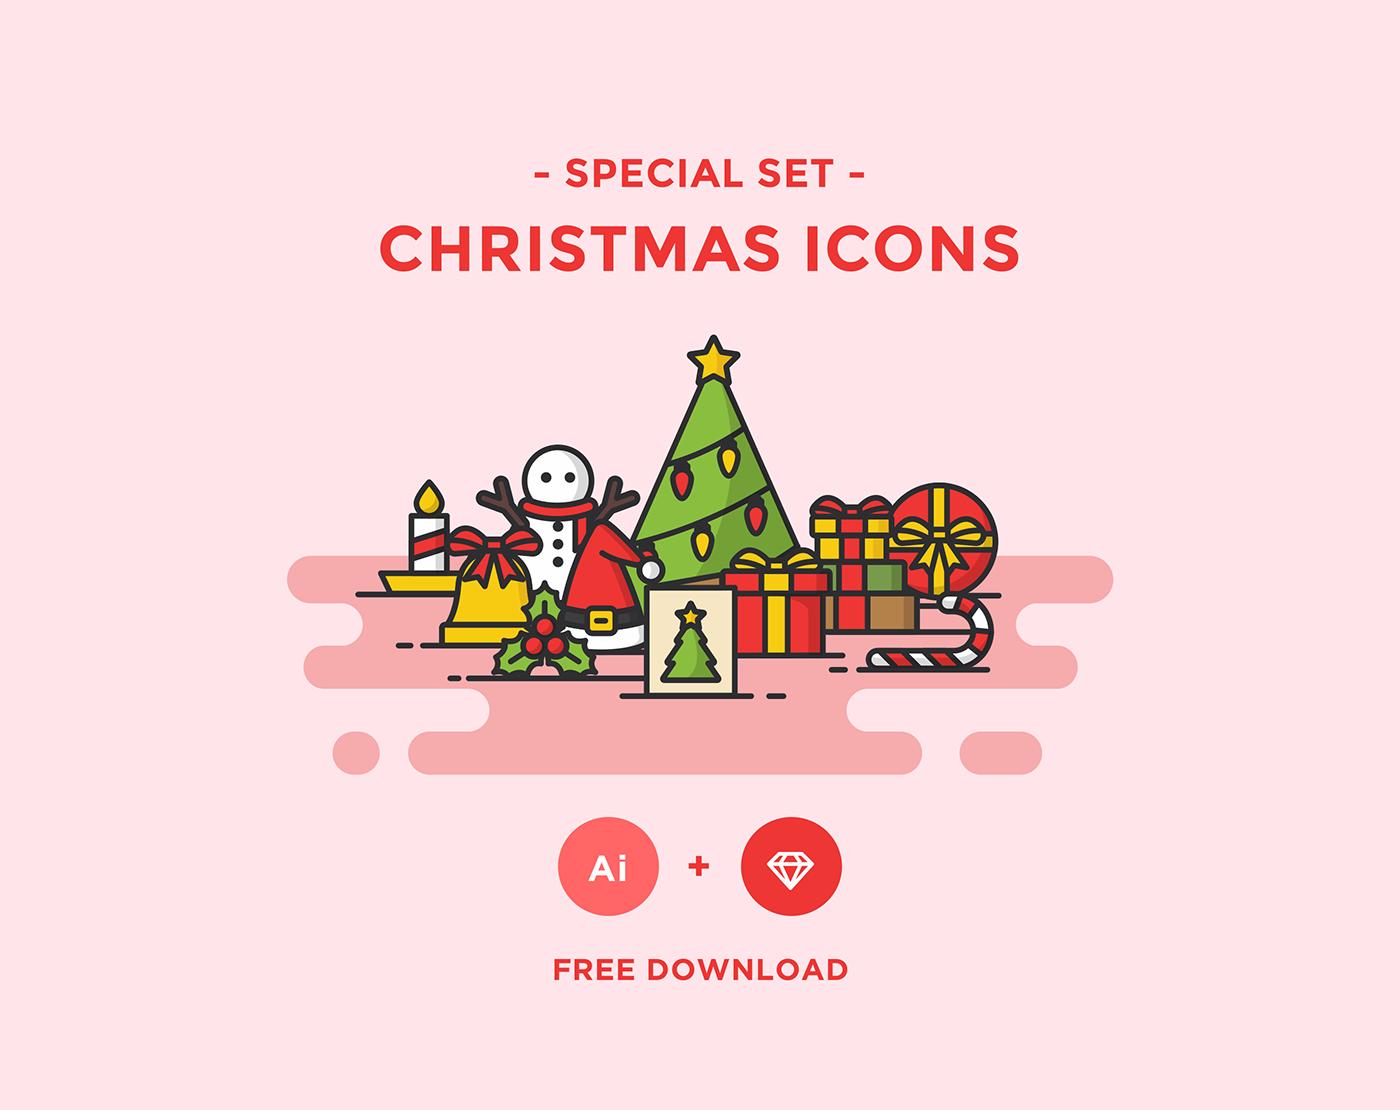 free icons download Christmas free icon christmas icon Christmas Icons flat flat icon line icon free